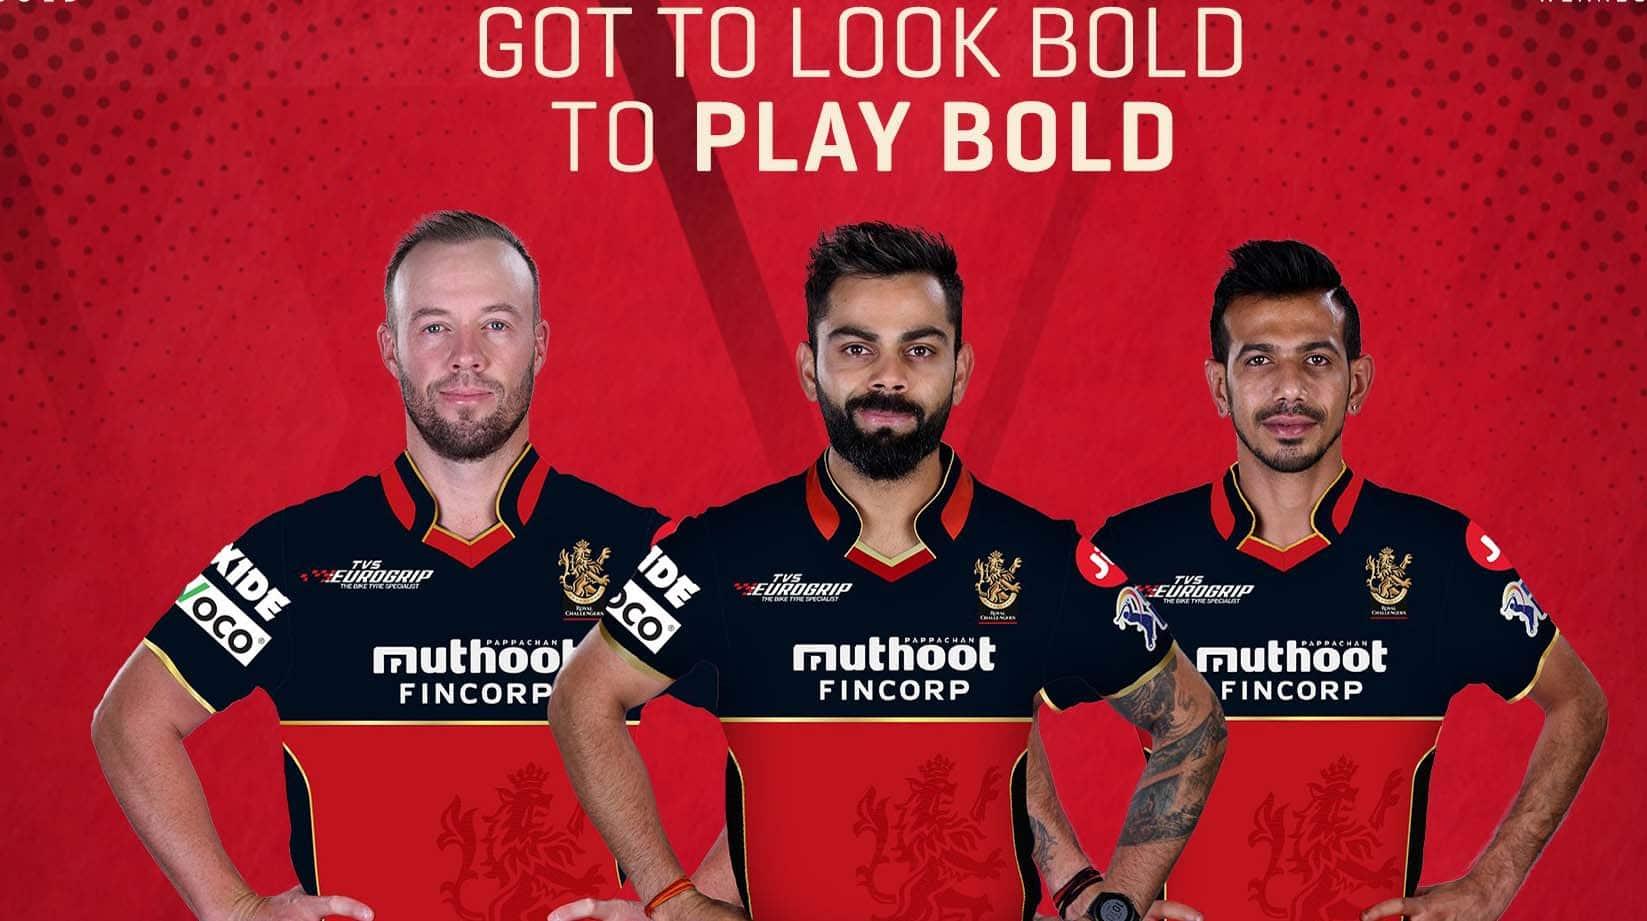 Virat Kohli, Yuzvendra Chahal, AB de Villiers pose in new RCB jersey ahead of IPL 2020